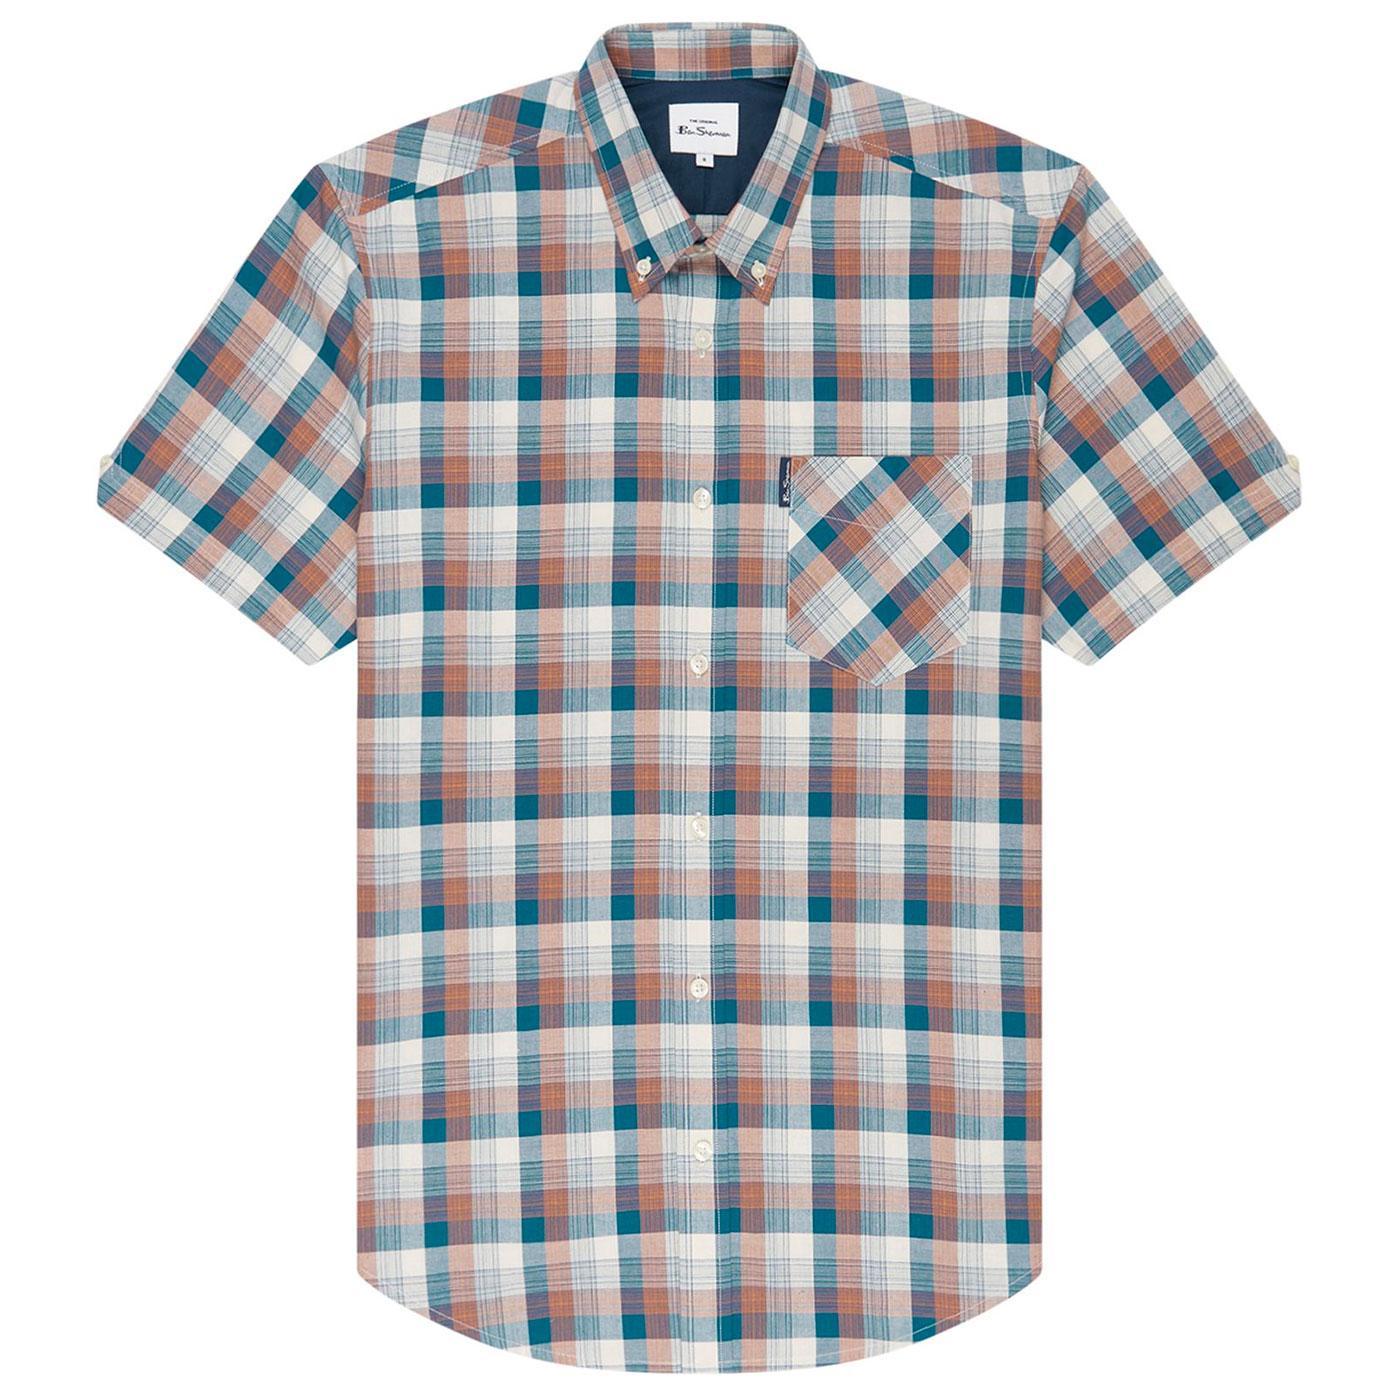 BEN SHERMAN Retro Mod 70s Gradient Check Shirt S